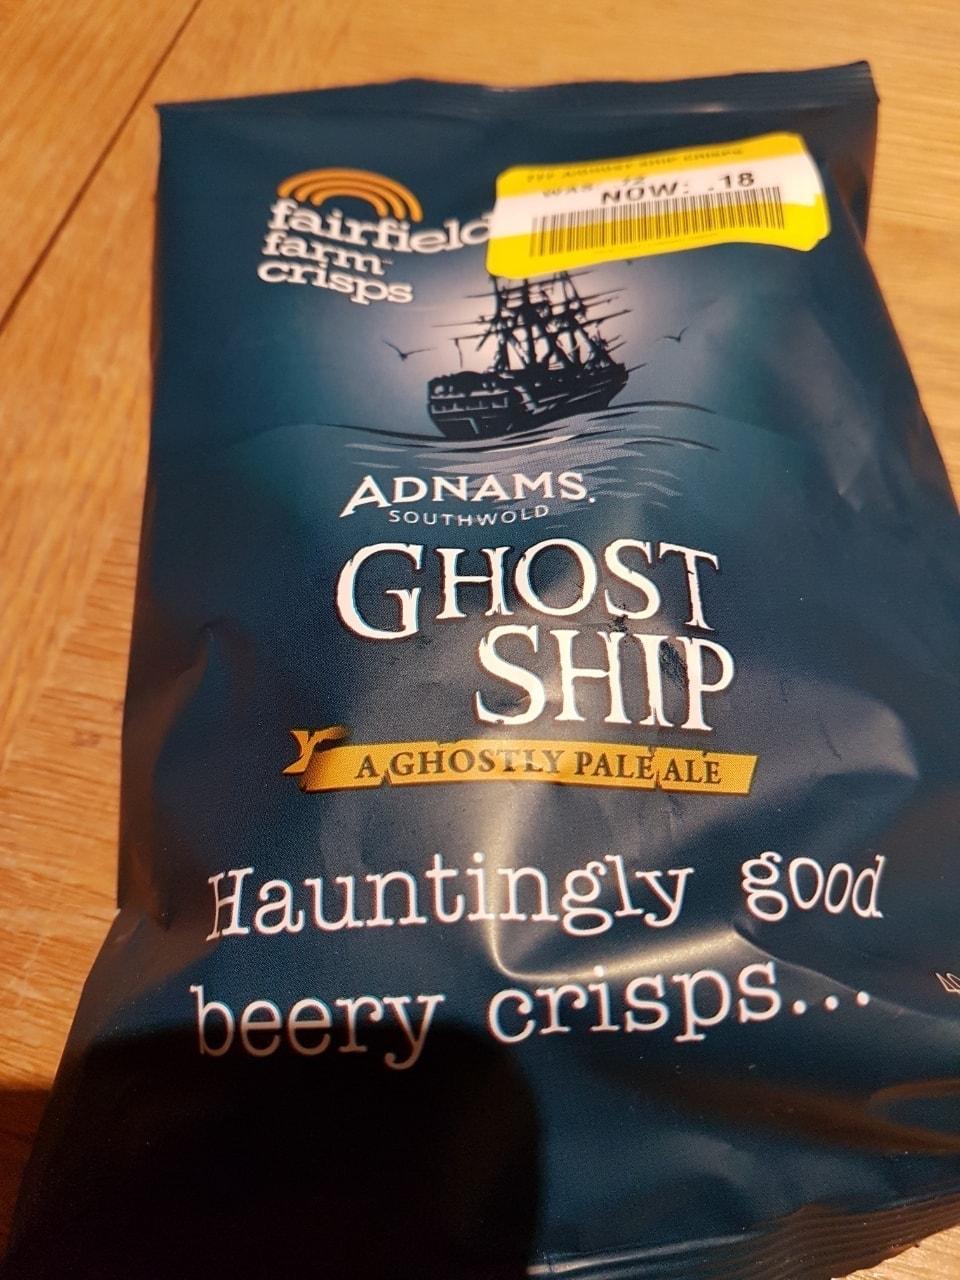 Adnams Ghost ship crisps